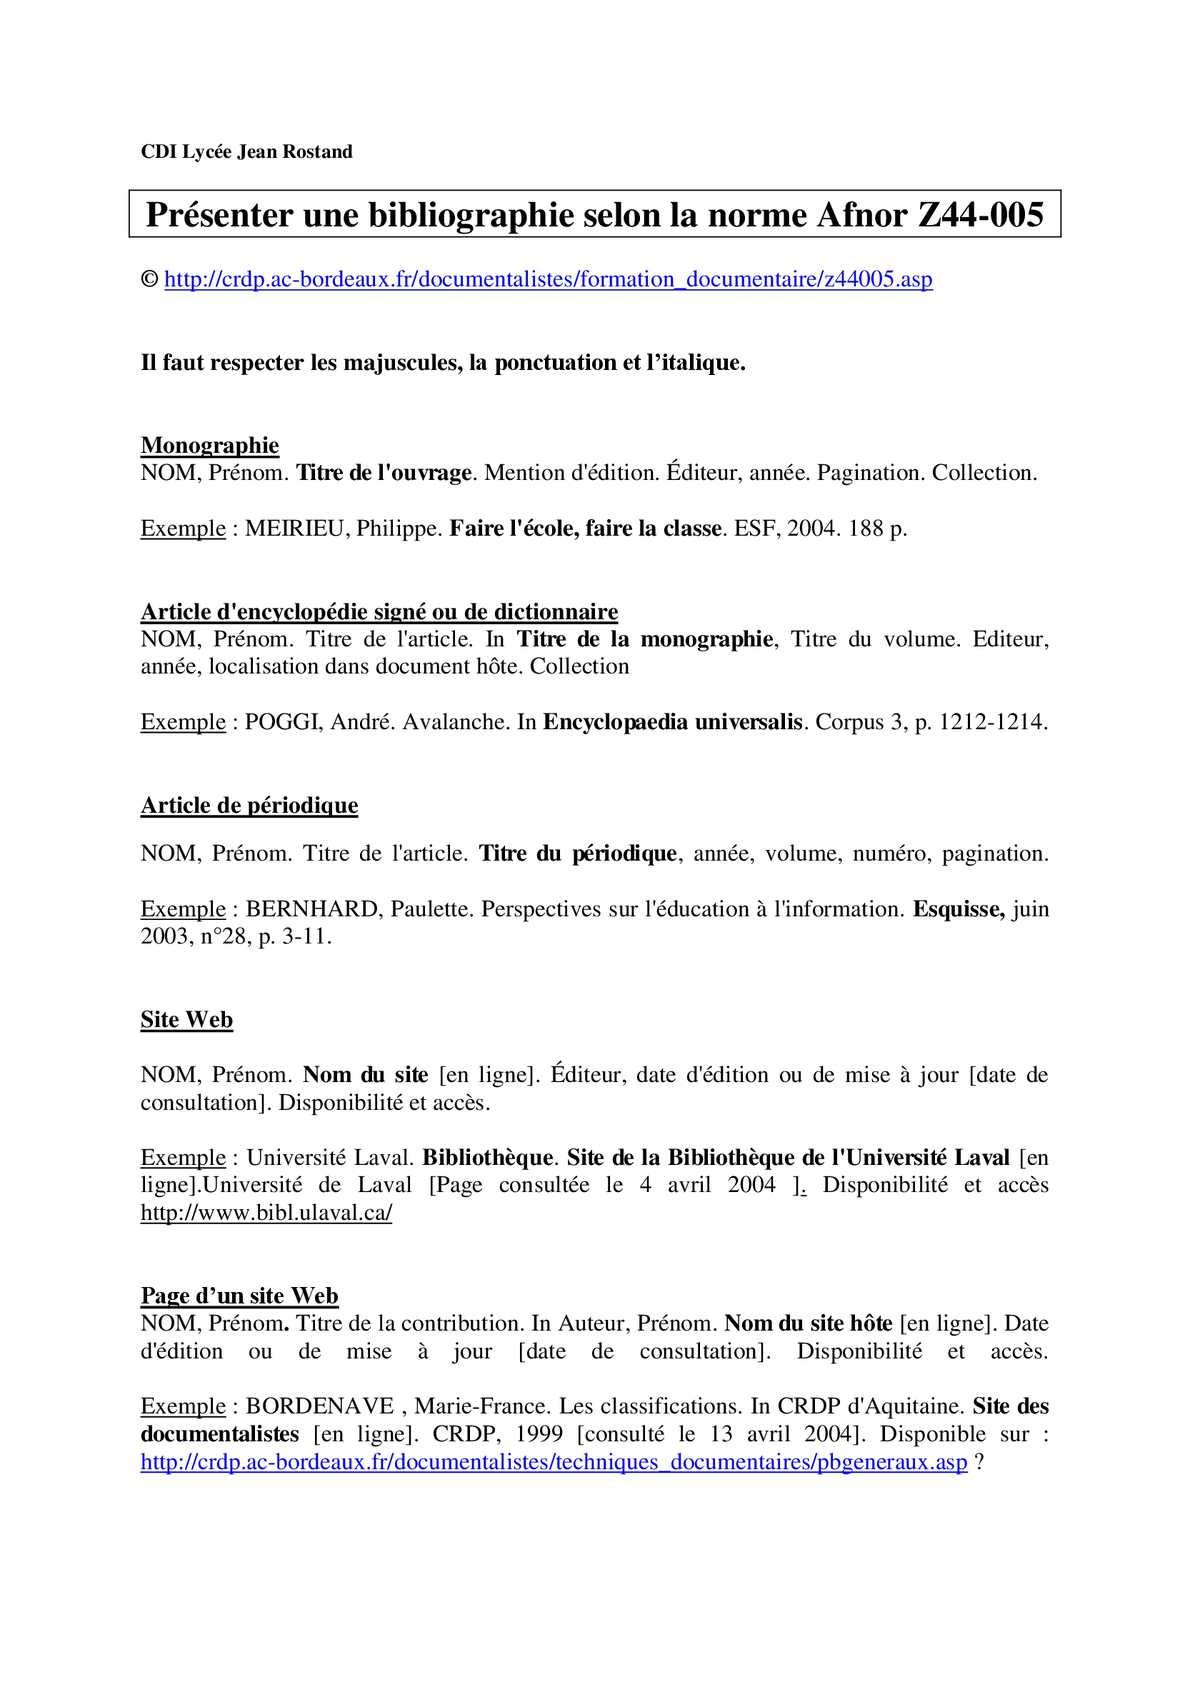 encyclopédie universalis jean rostand pdf